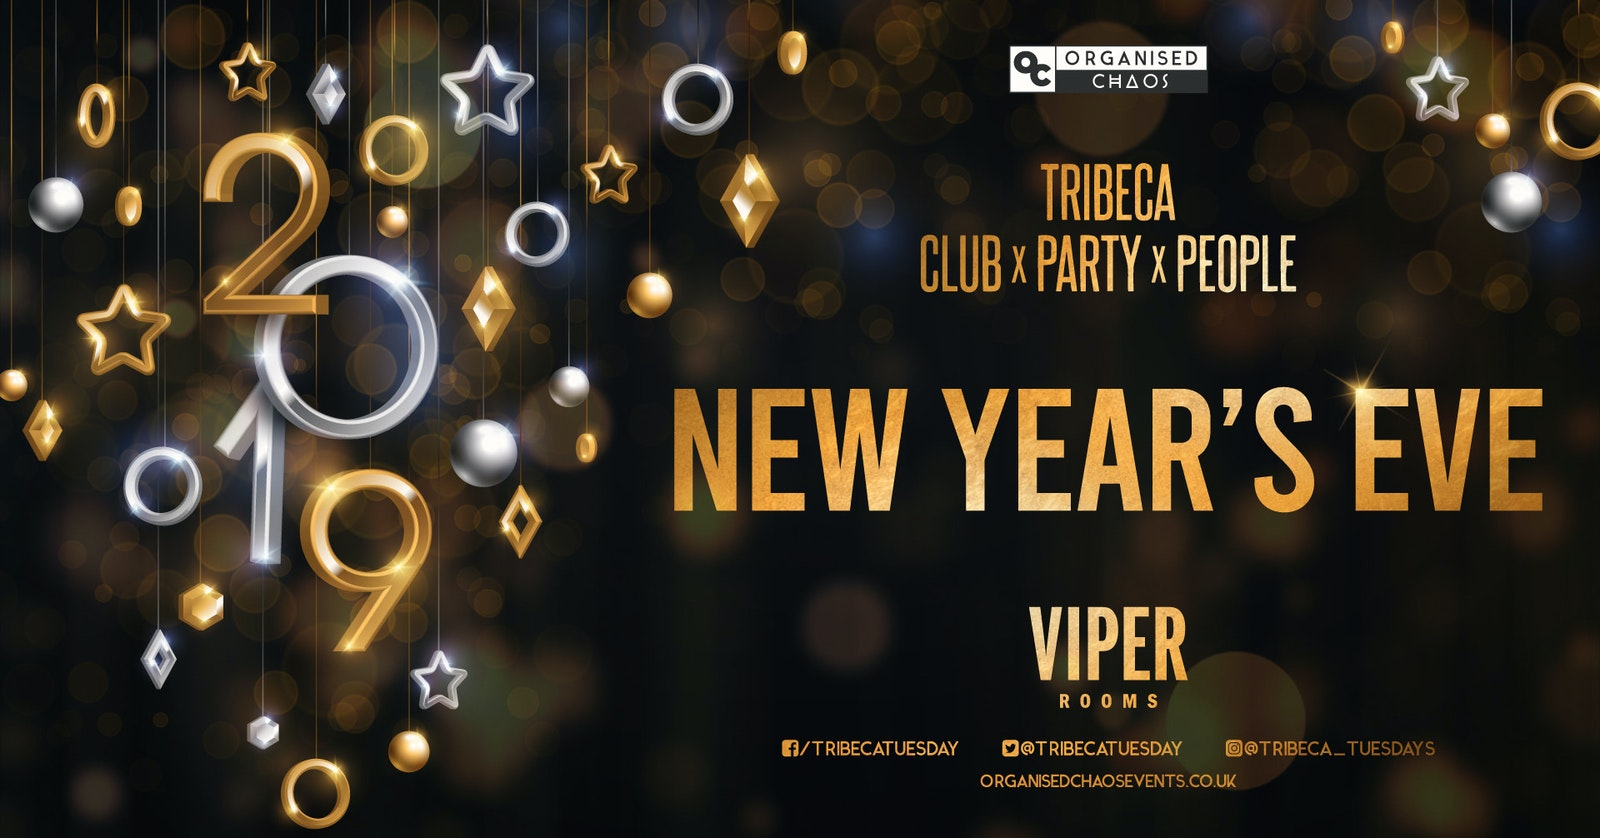 TRIBECA X VIPER – NEW YEARS EVE 2019